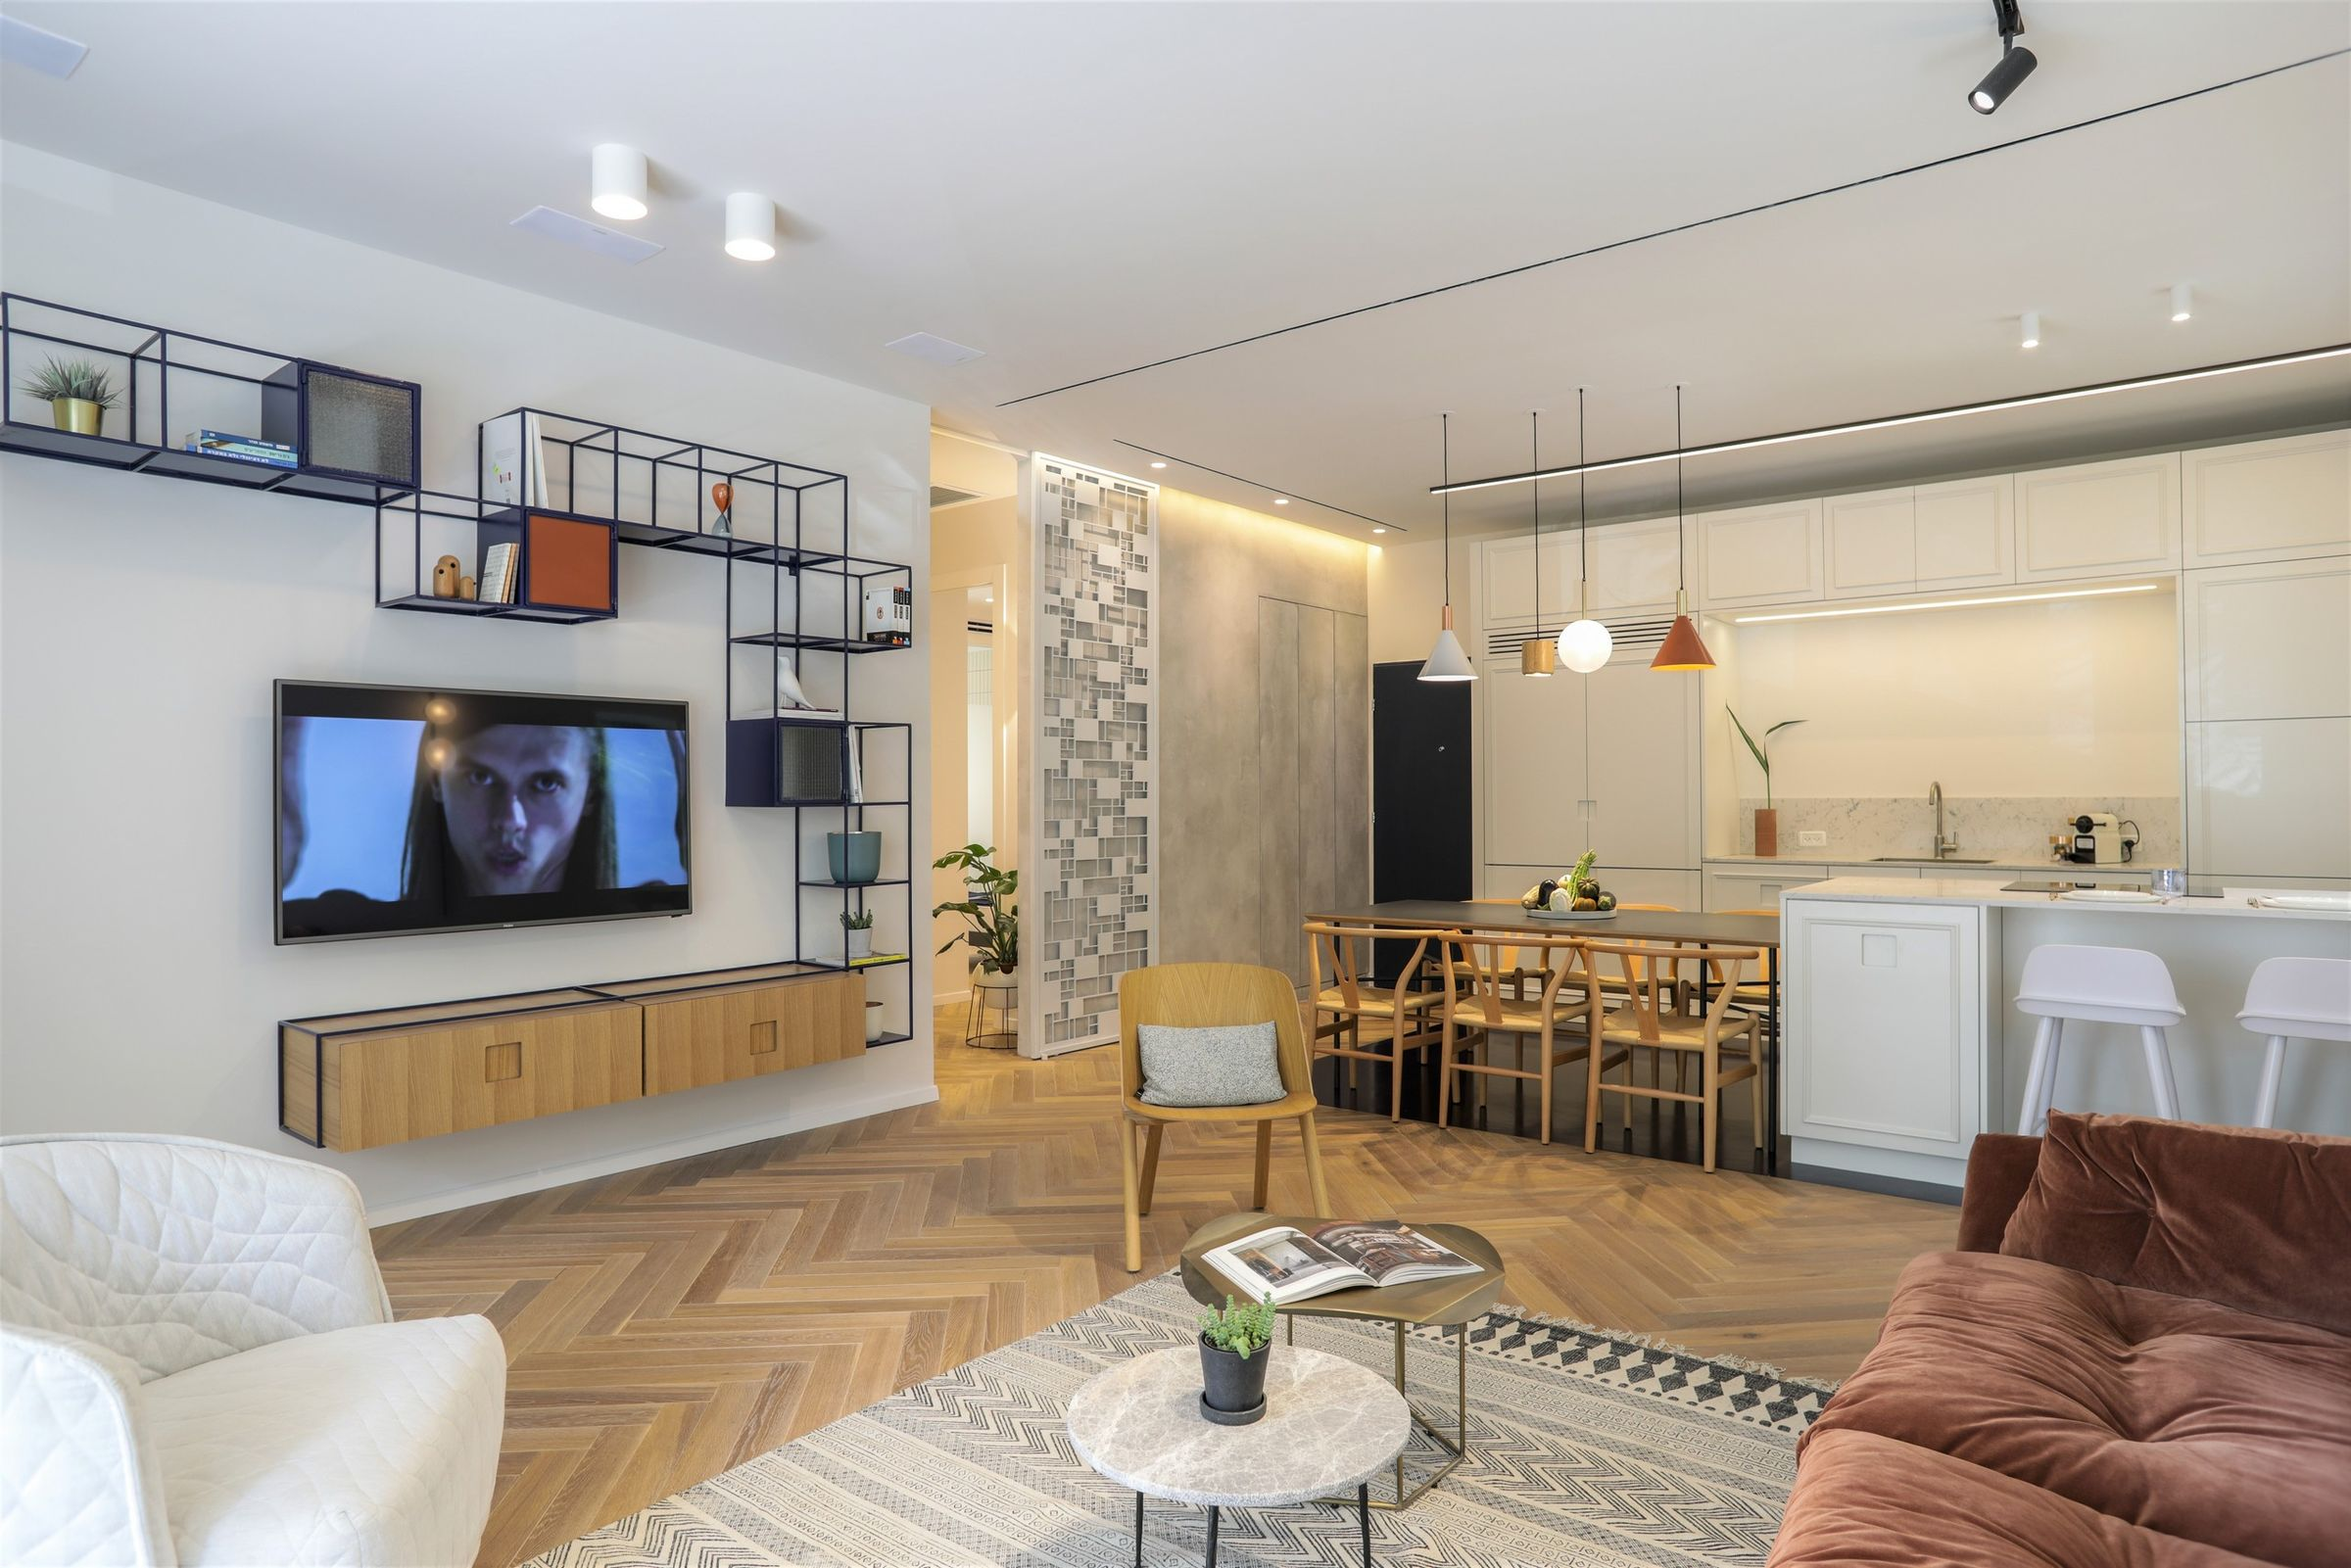 Arnon by the sea 0 architect dori interior design location tel aviv israel project year 2017 category private houses